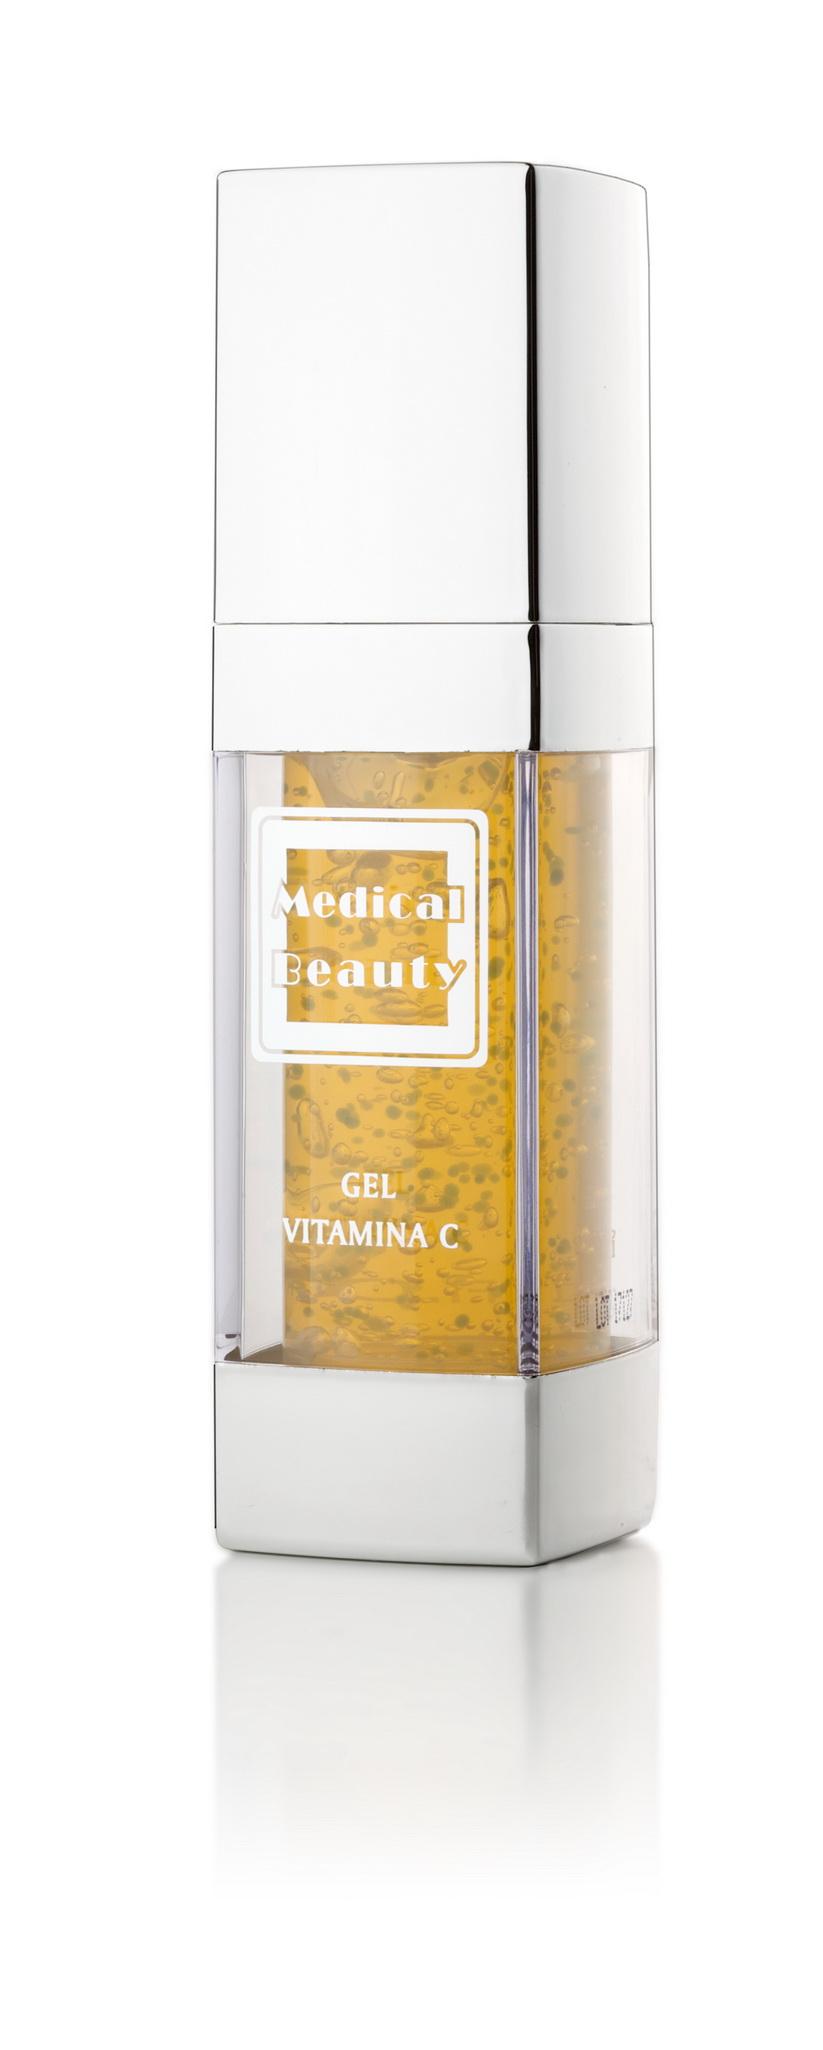 gel de vitamina C